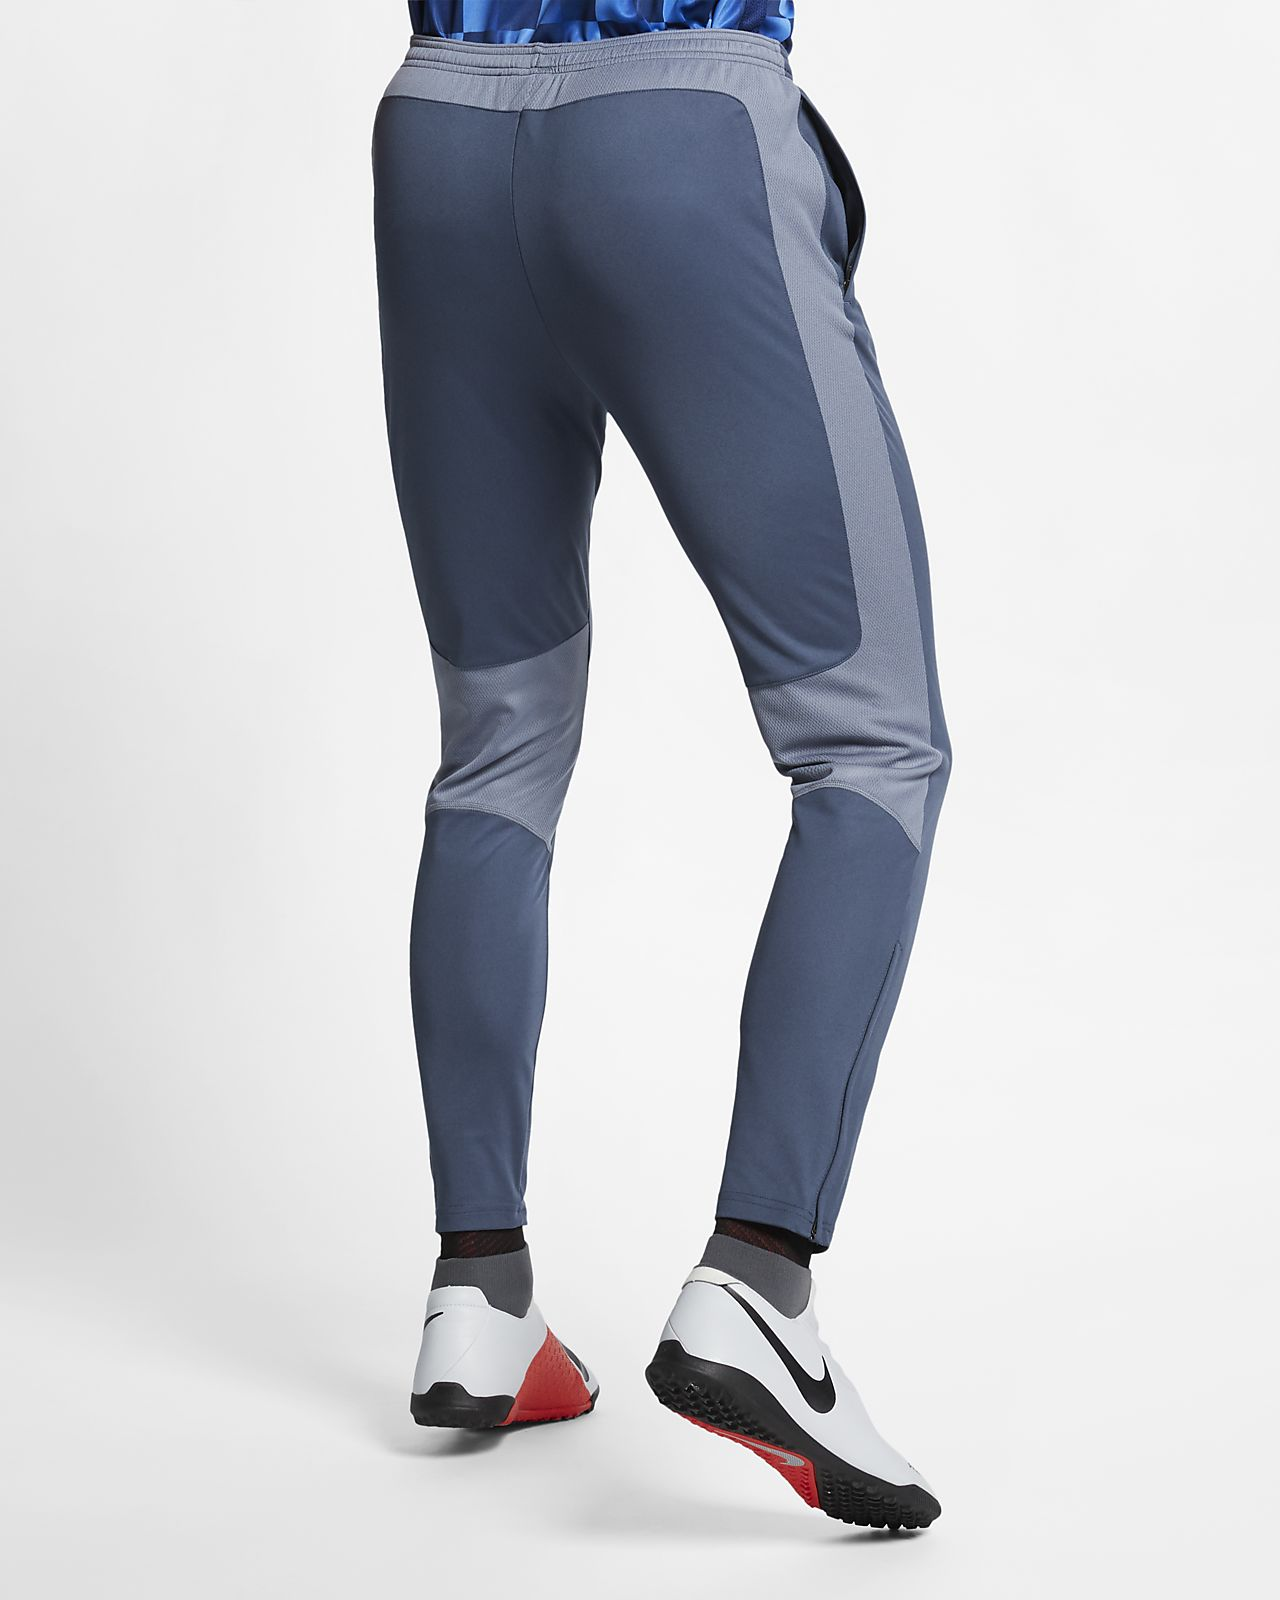 Pantalon De Football Nike Homme Dri Fit Pour Academy 2IDH9E